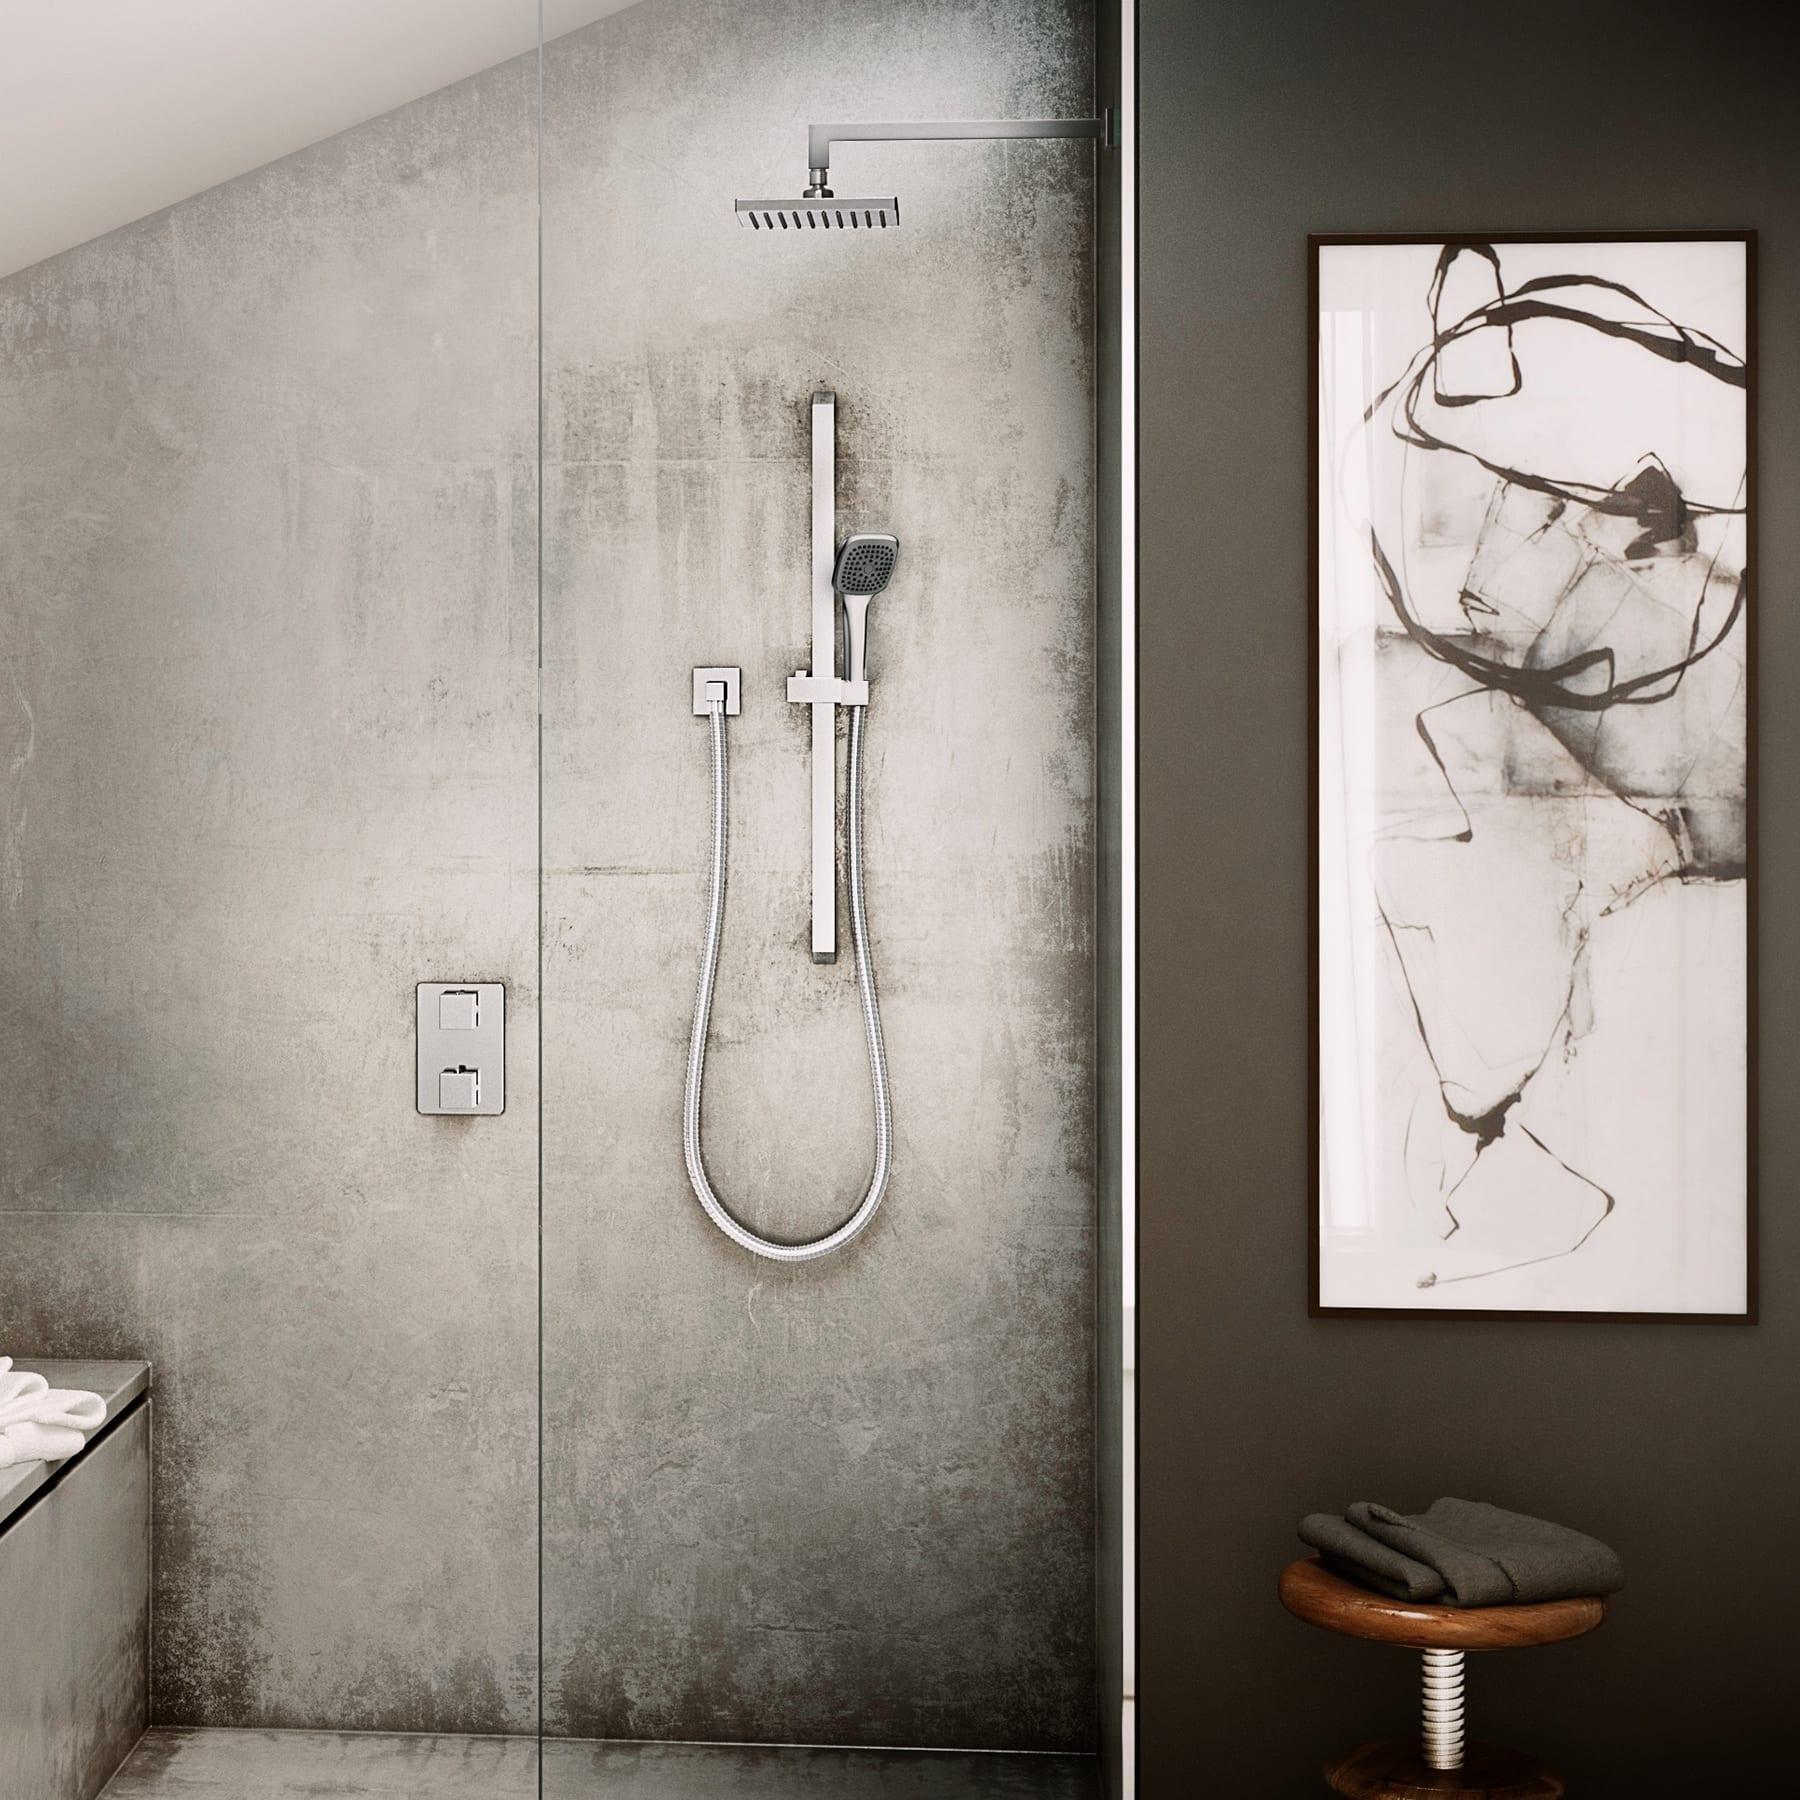 Kit: Shower Faucet - Complete model for Thermostatic Diverter Valve ...